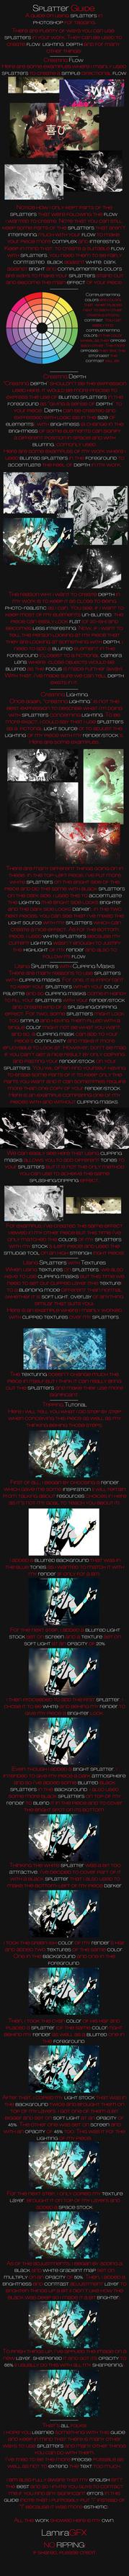 The Splatter Guide by LamiraGFX